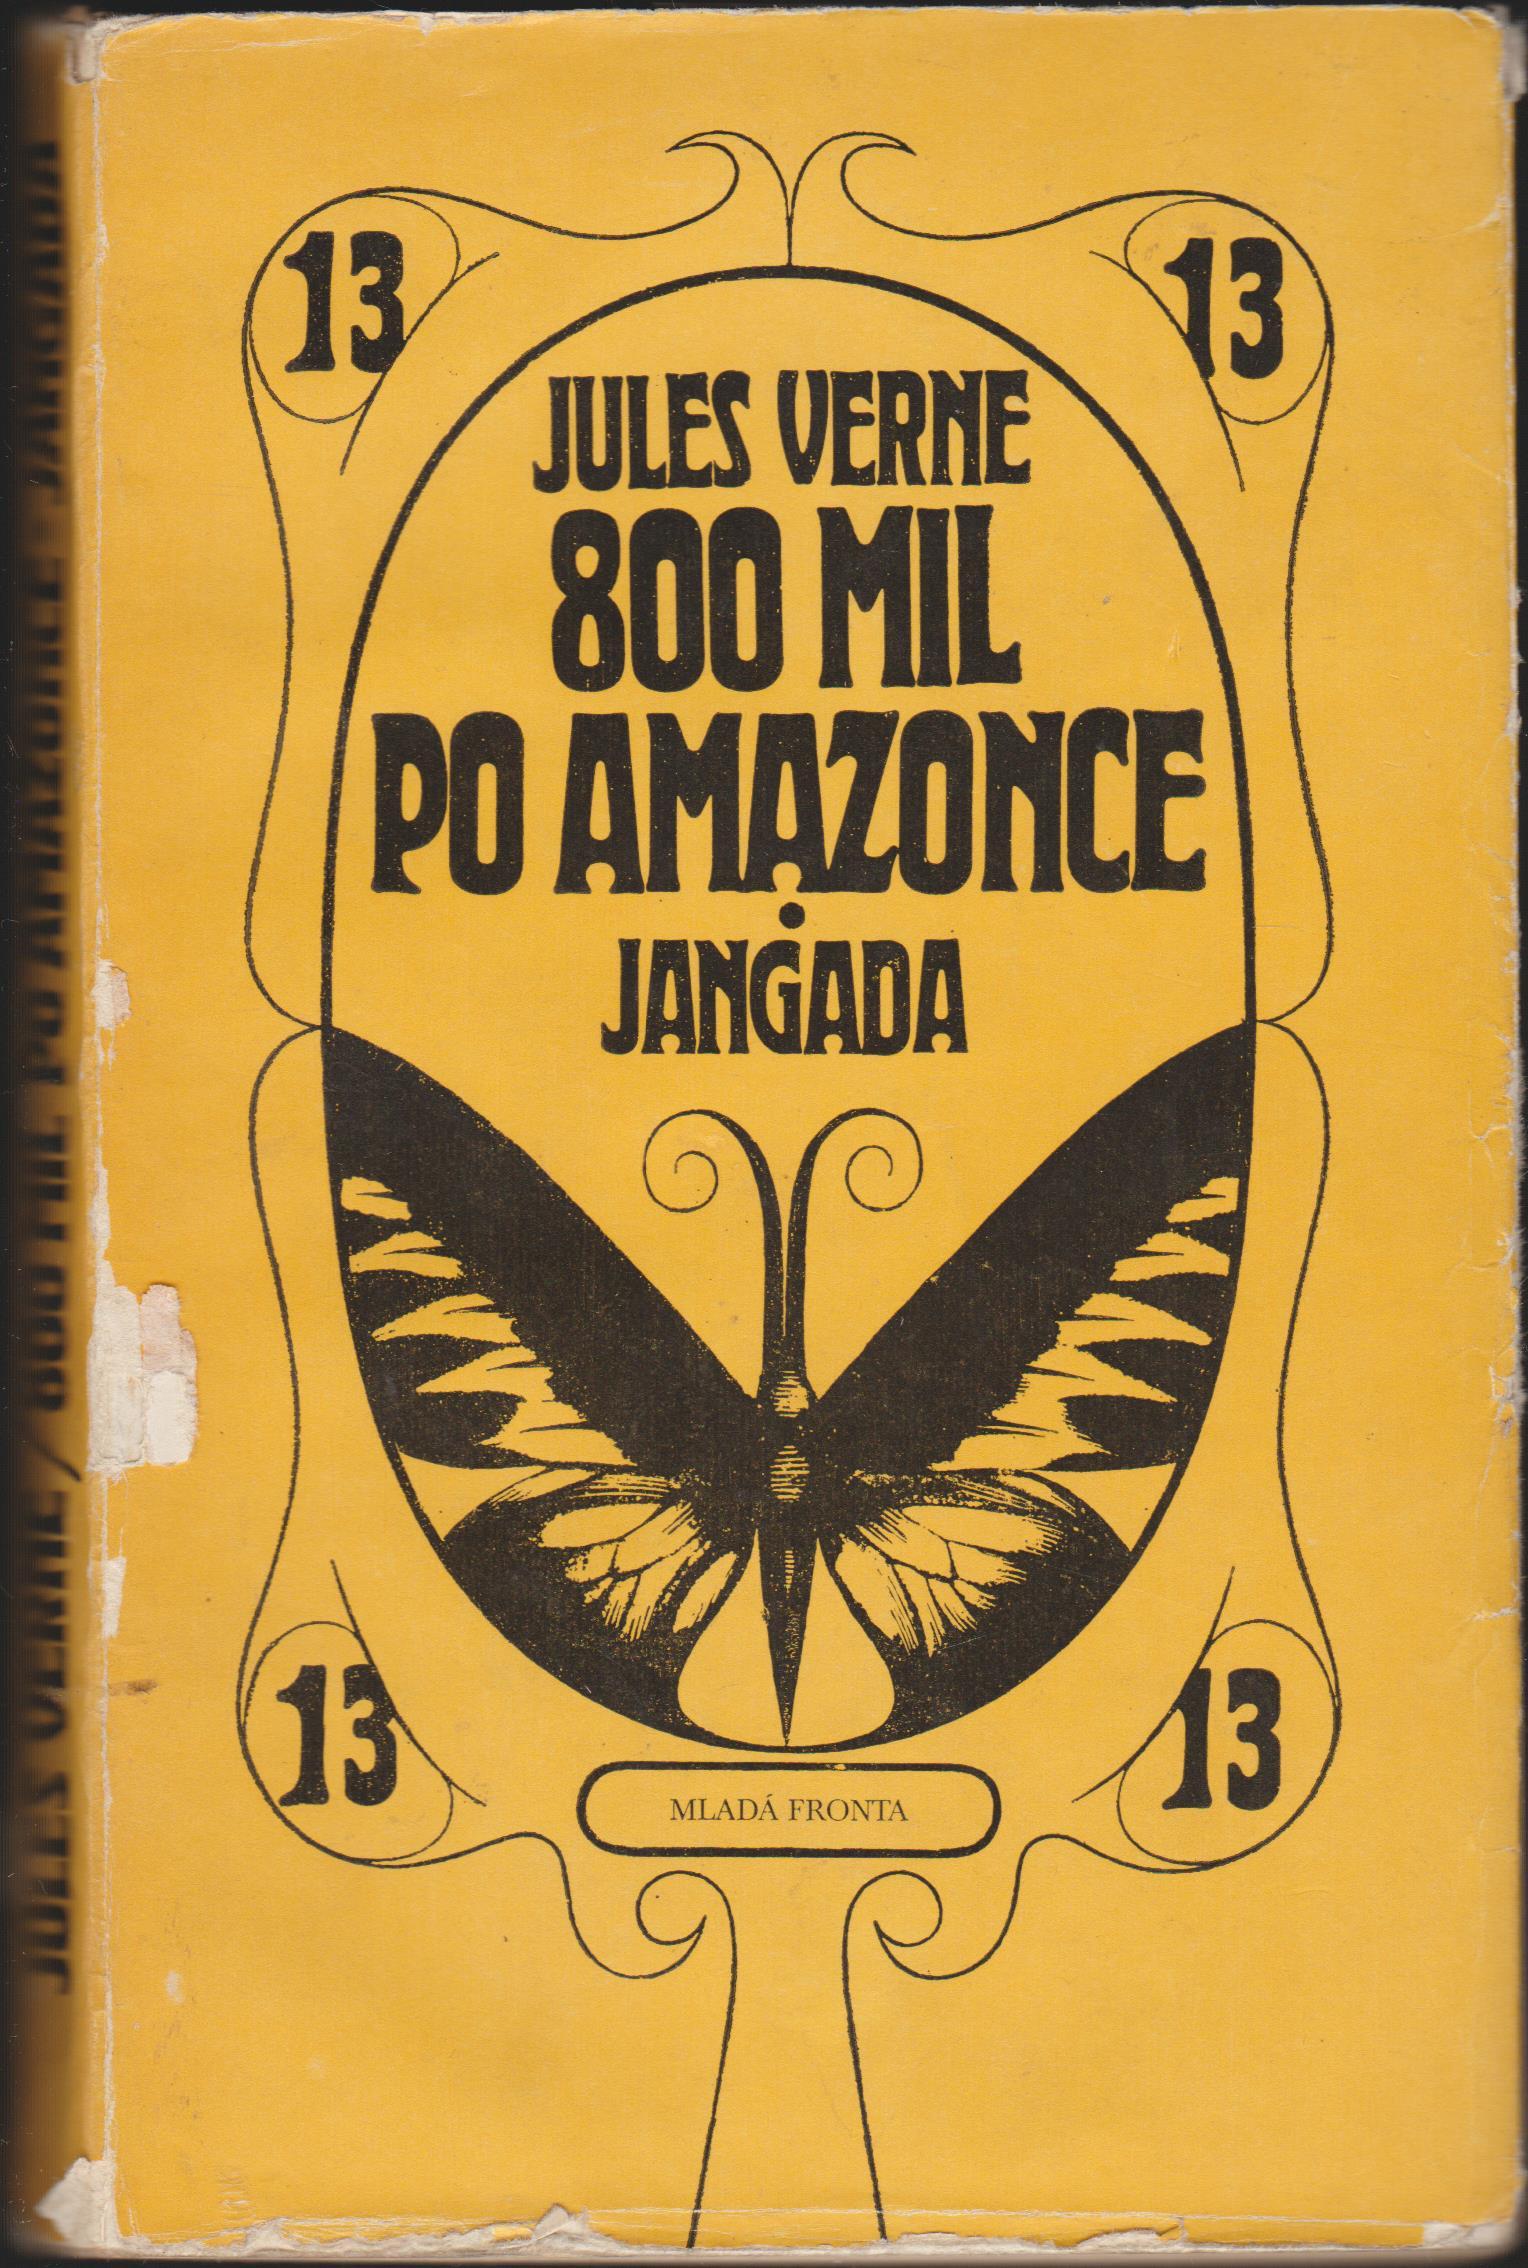 800 mil po Amazonce Jangada - Jules Verne